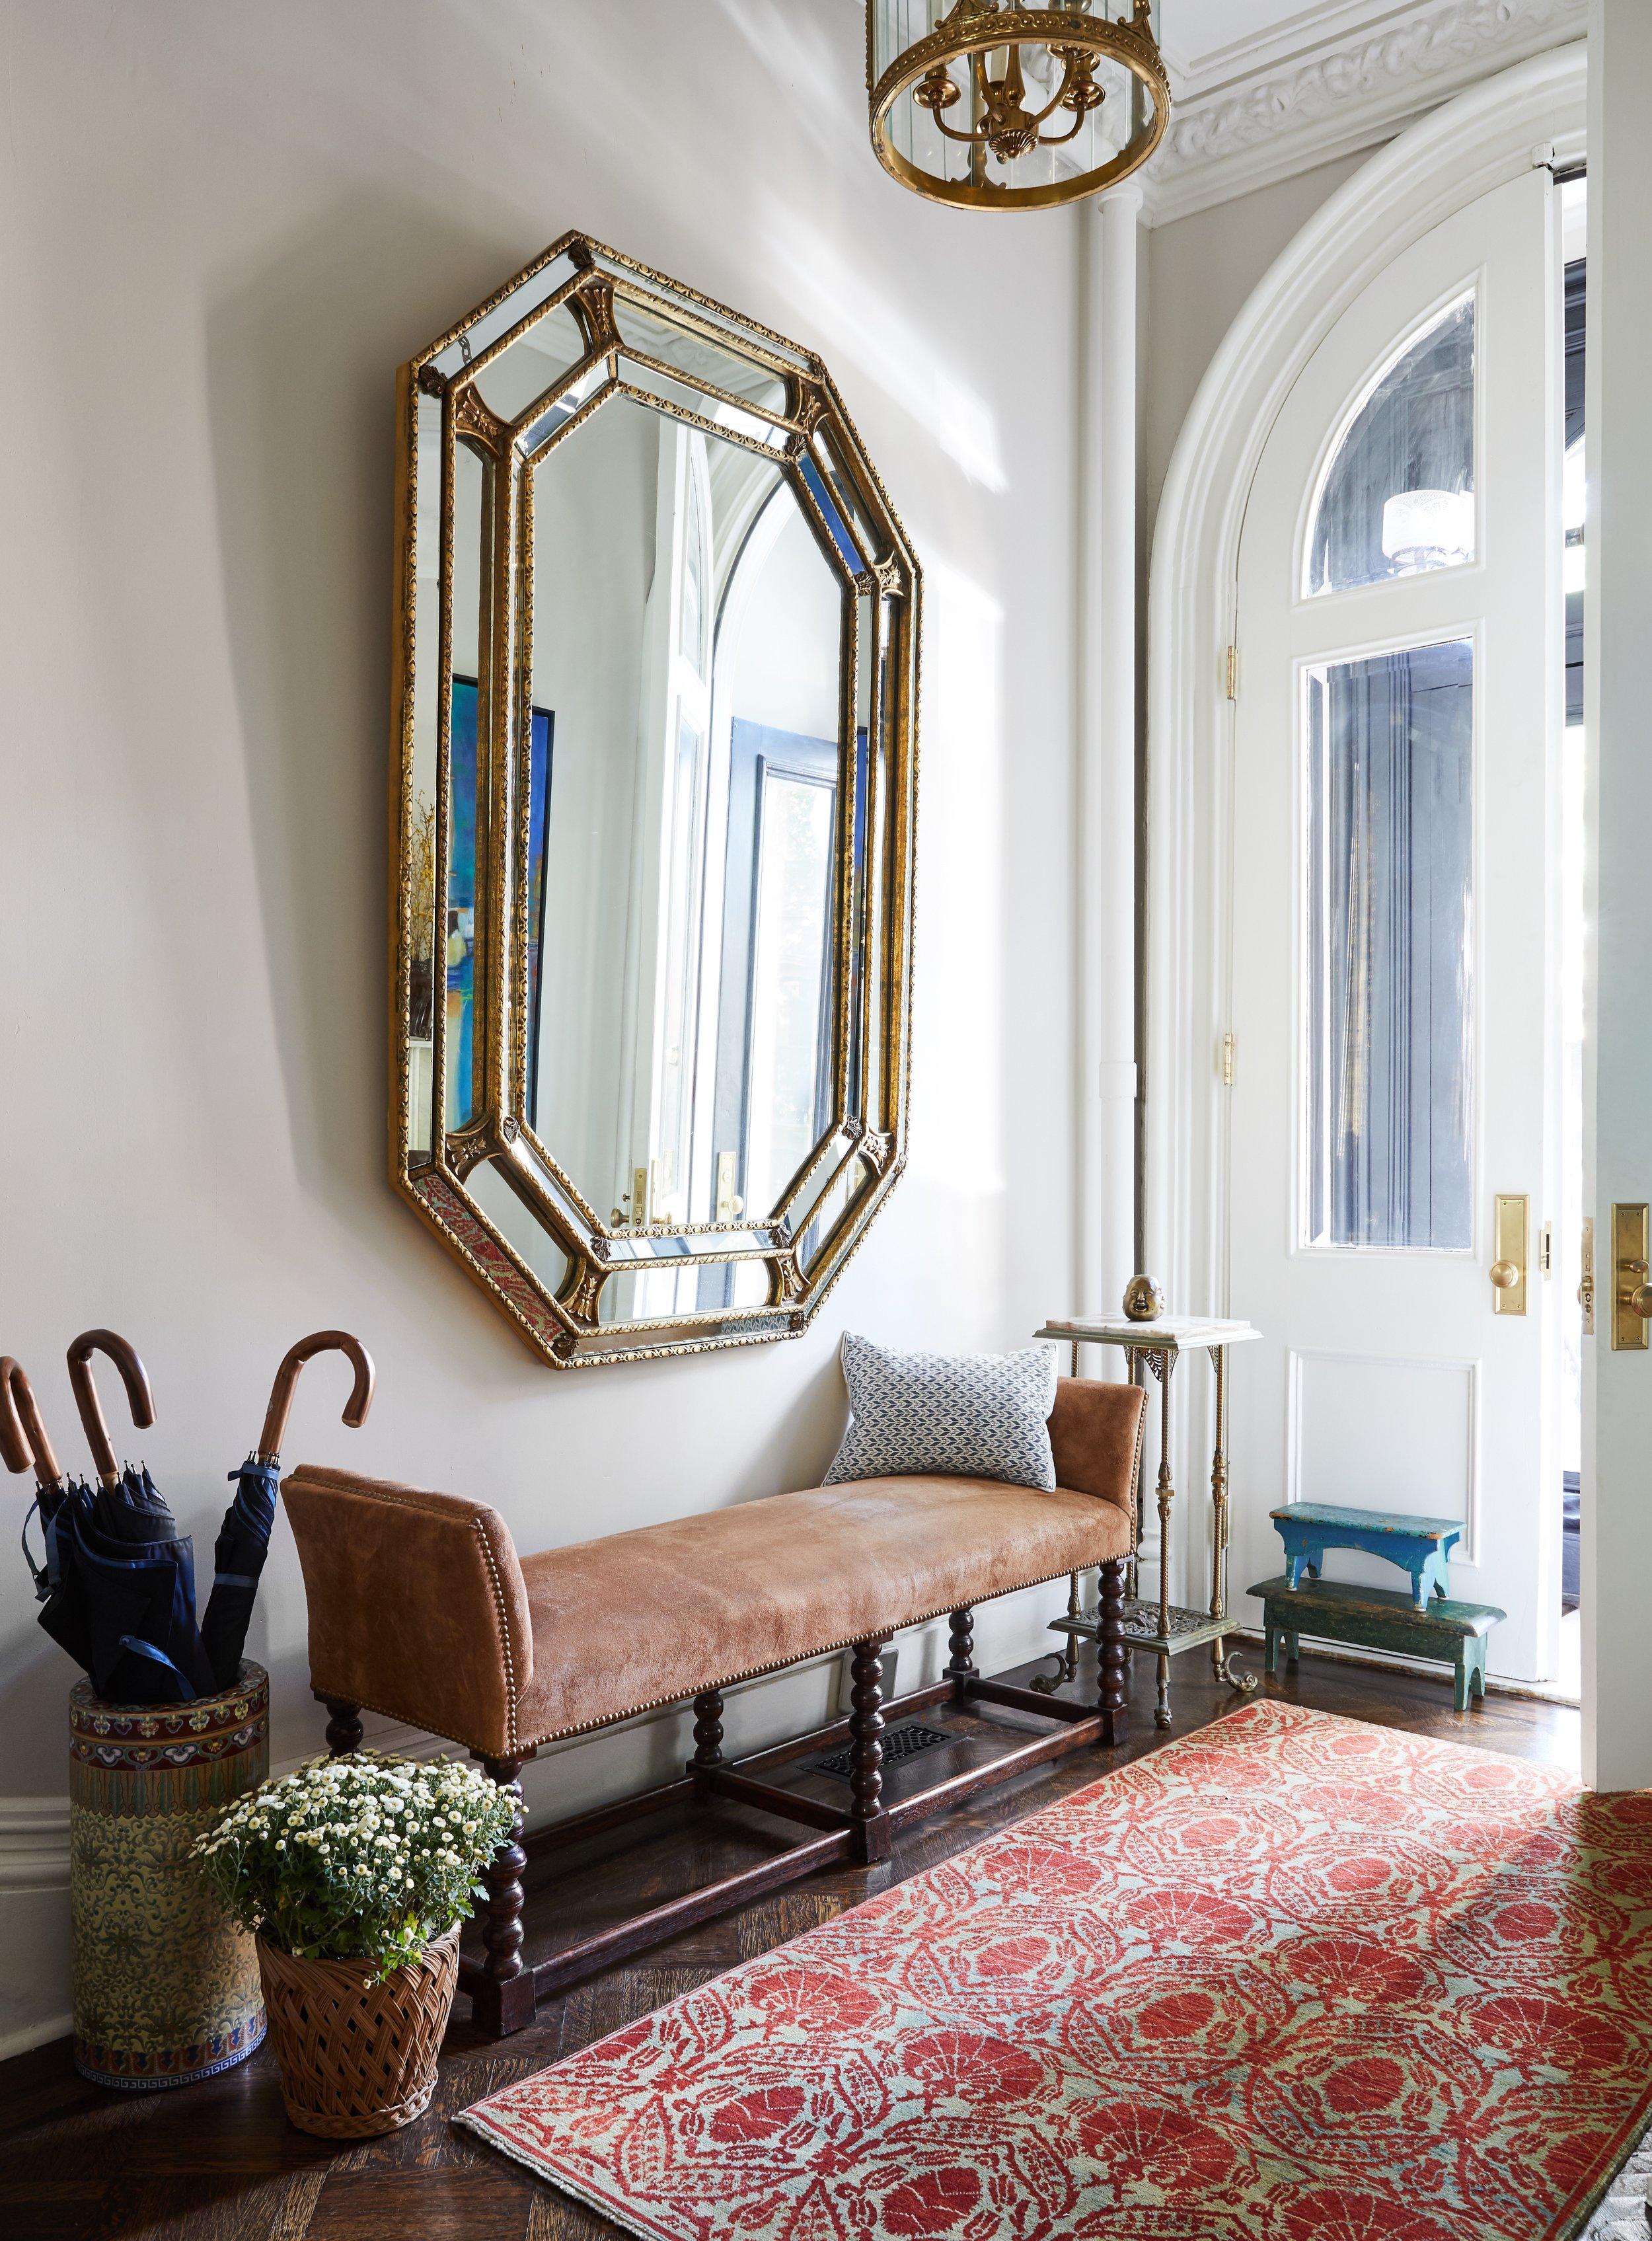 LAVA-interiors-Brooklyn-Brownstone-NYC-Interior-Design-Entry-FoyeR.jpg